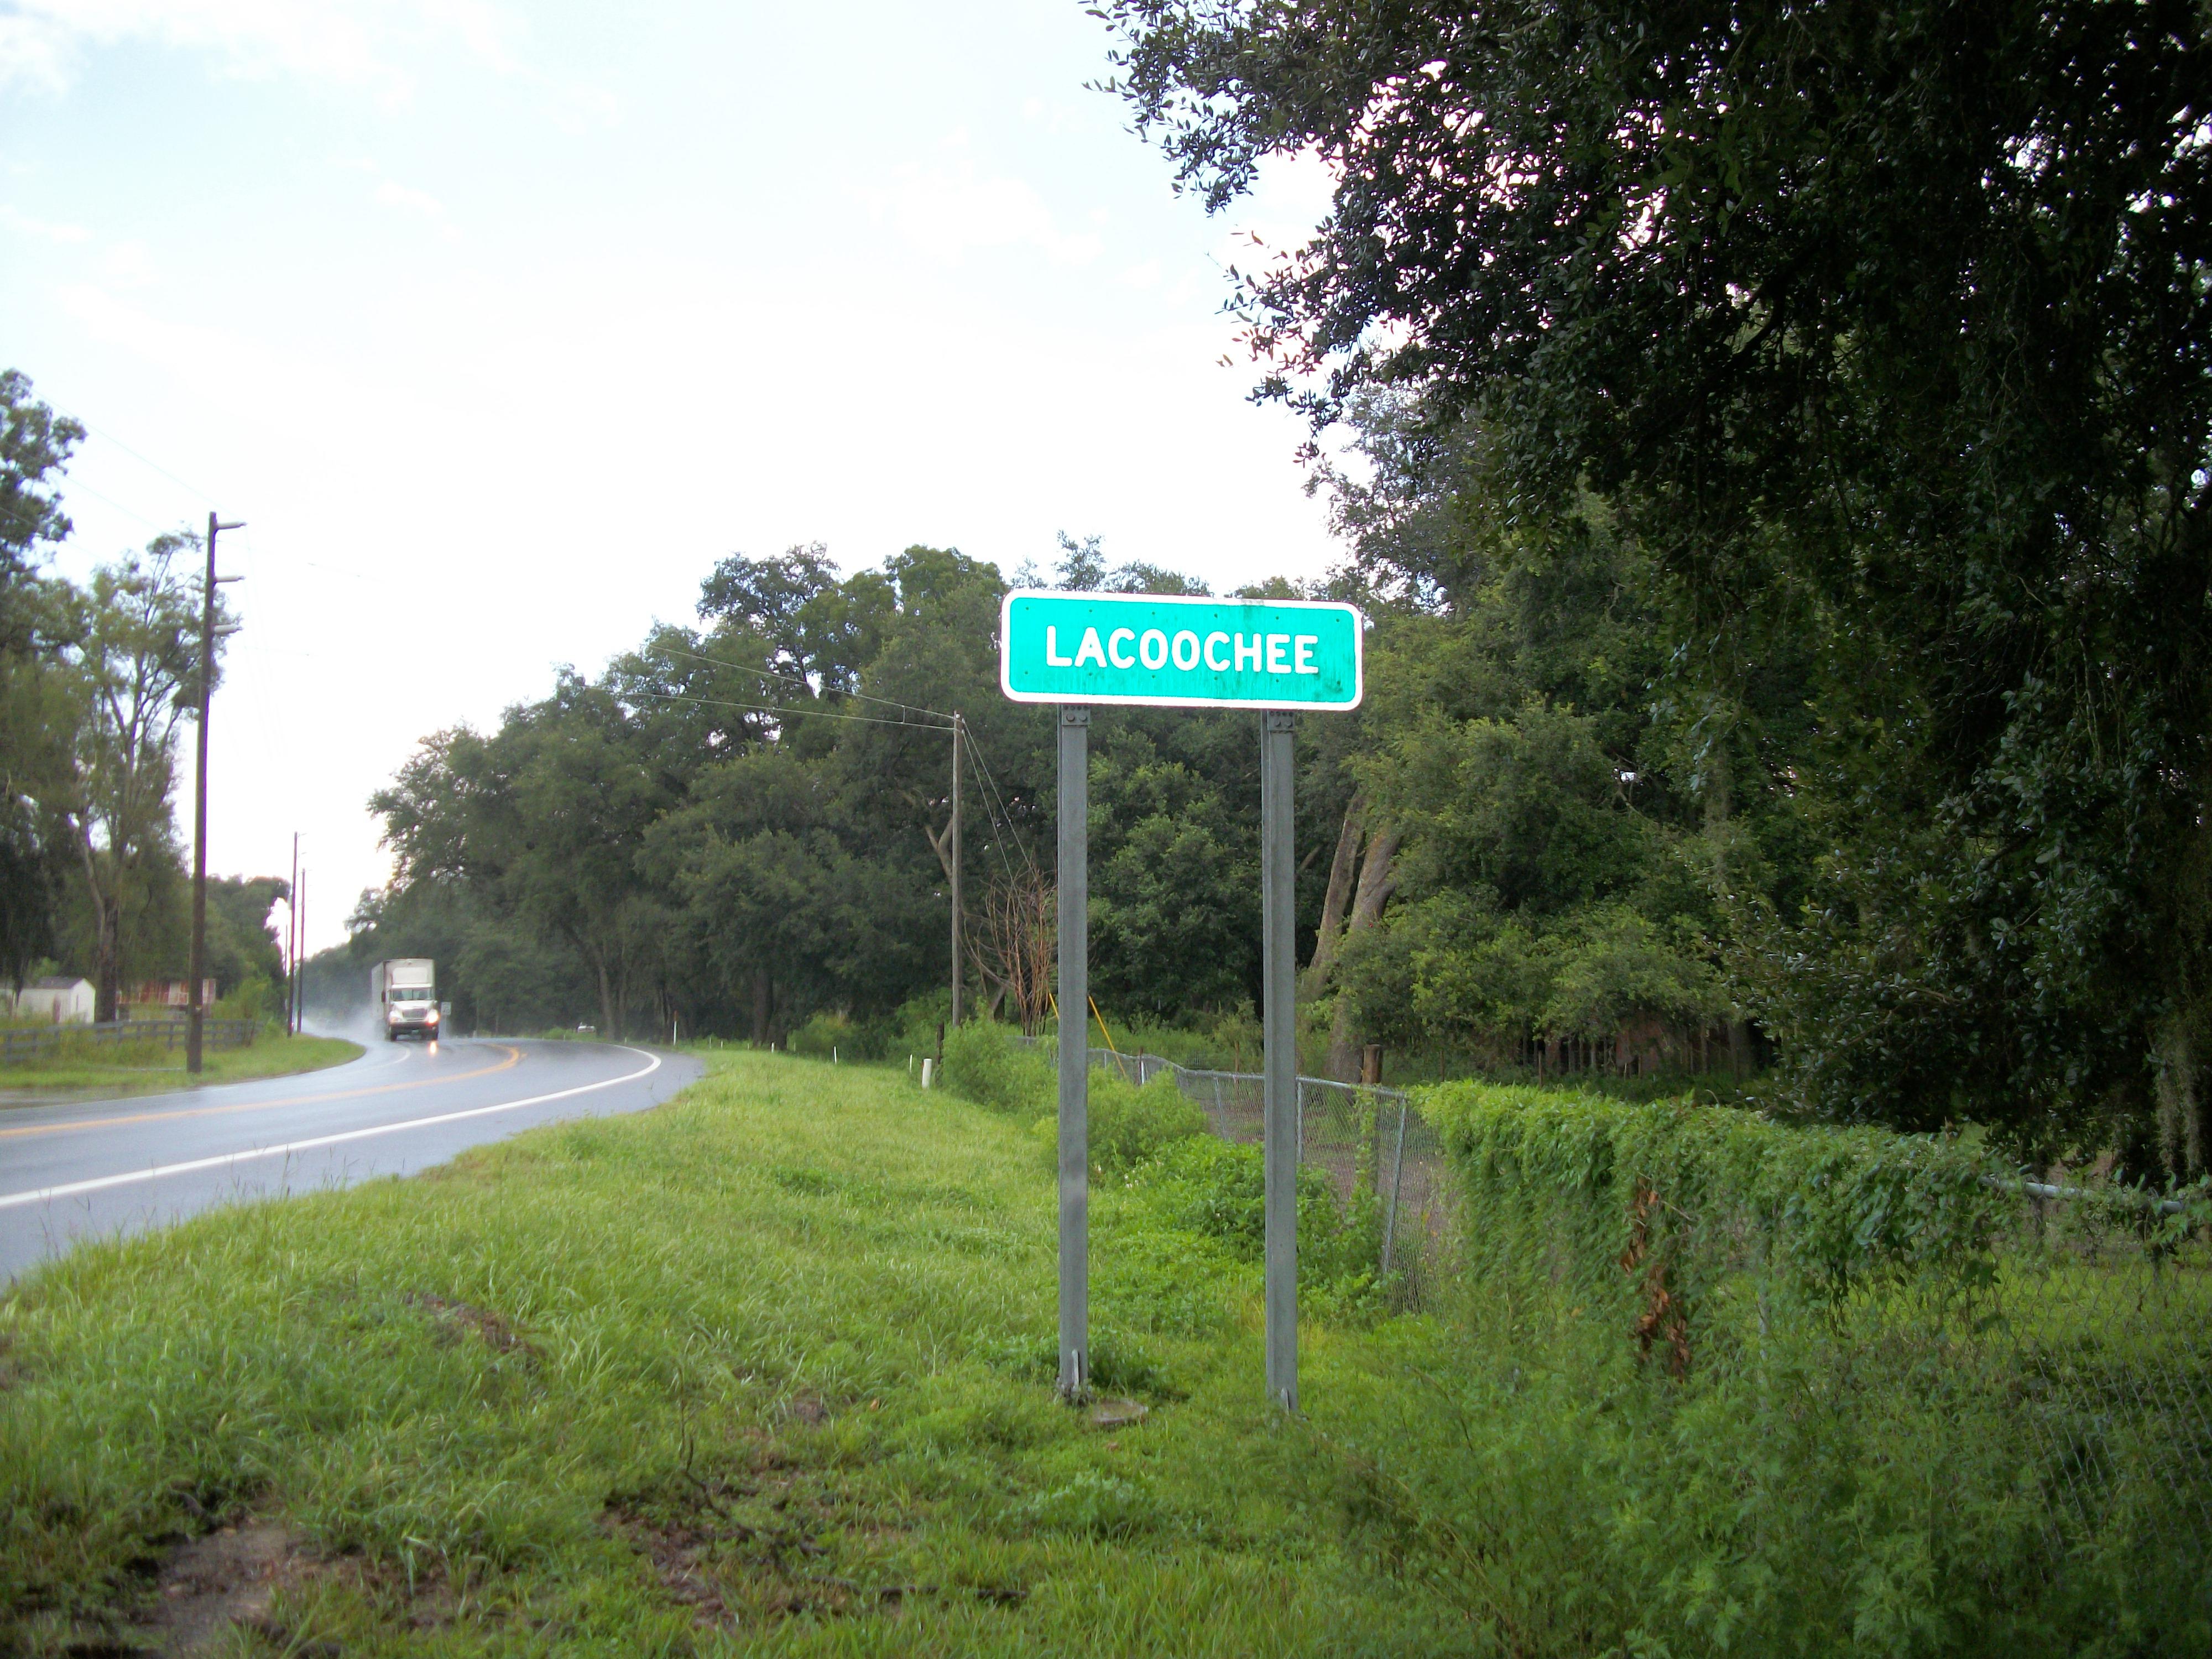 File Rosewood Florida Rc12409 Jpg: File:Lacoochee Sign On Florida SR 575.JPG